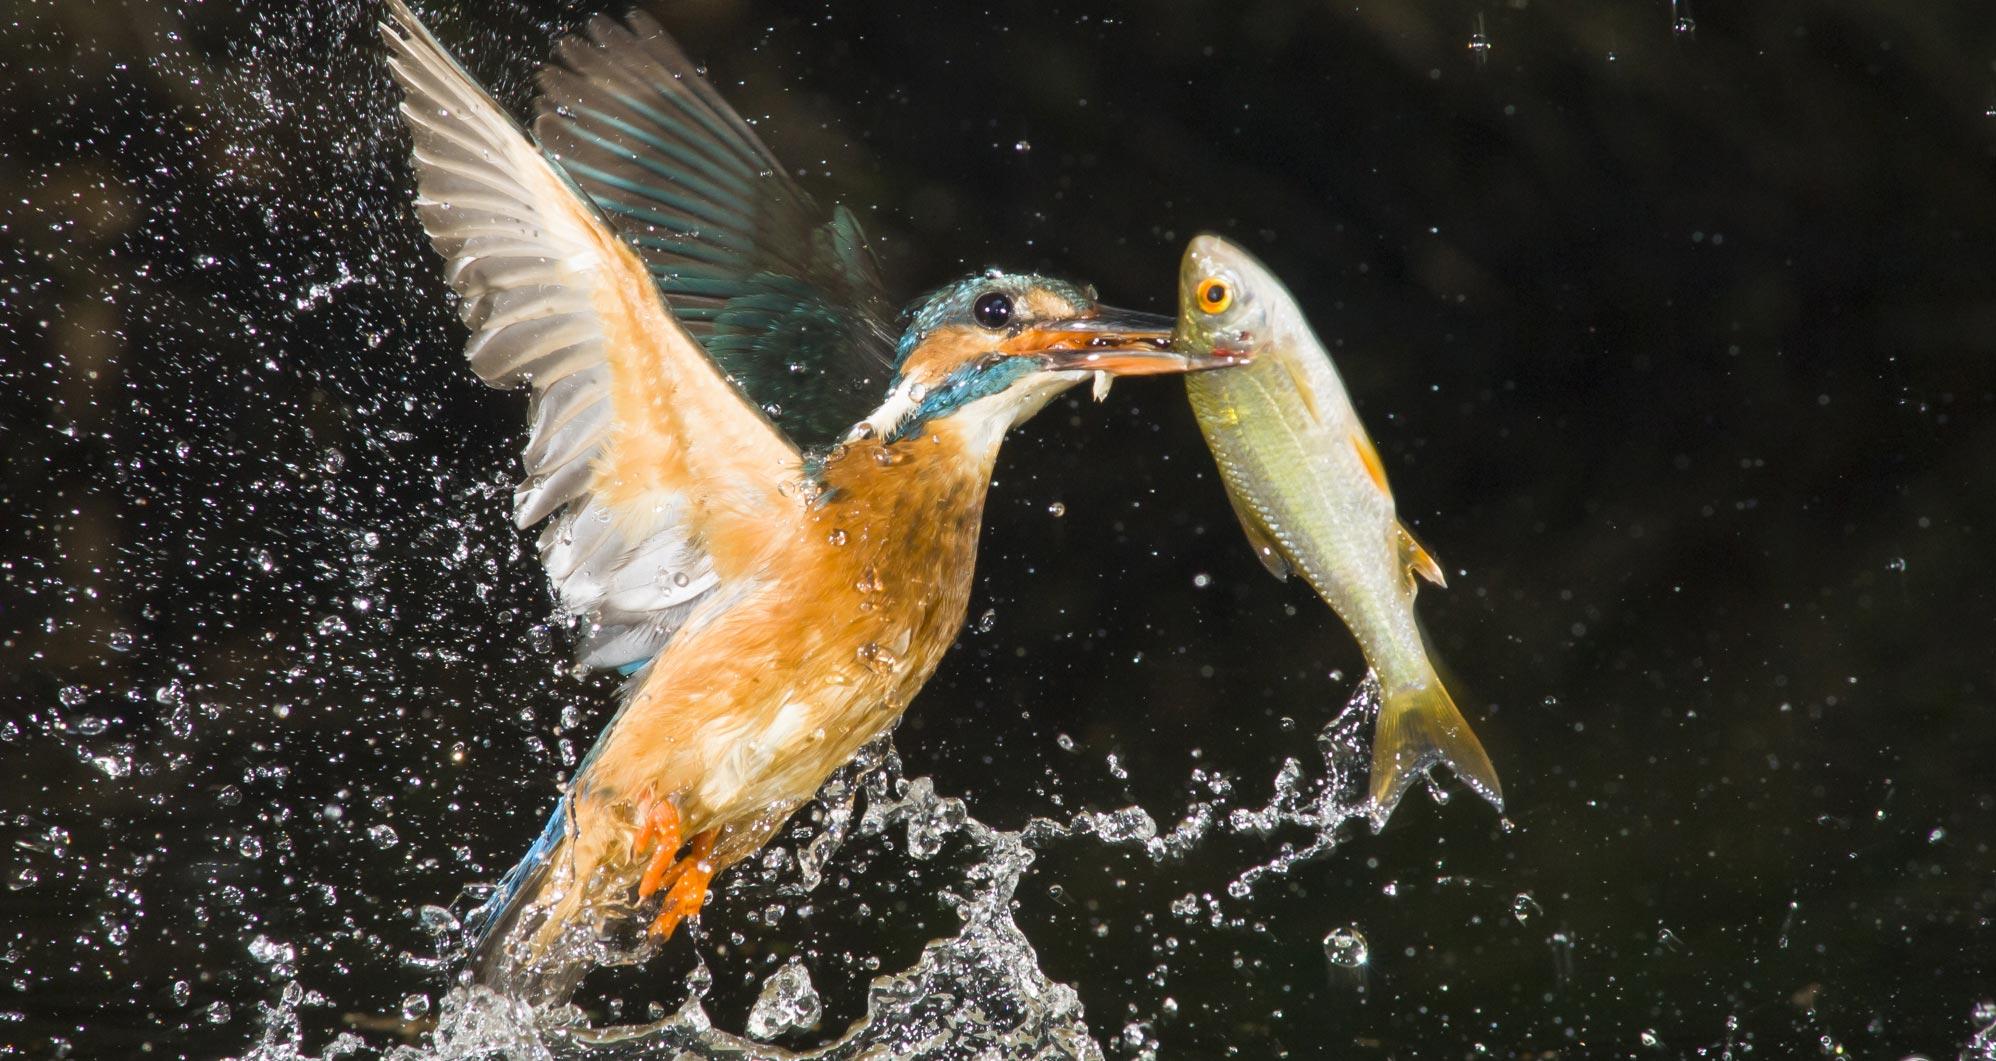 k-eisvogel-foto-karsten-mosebach